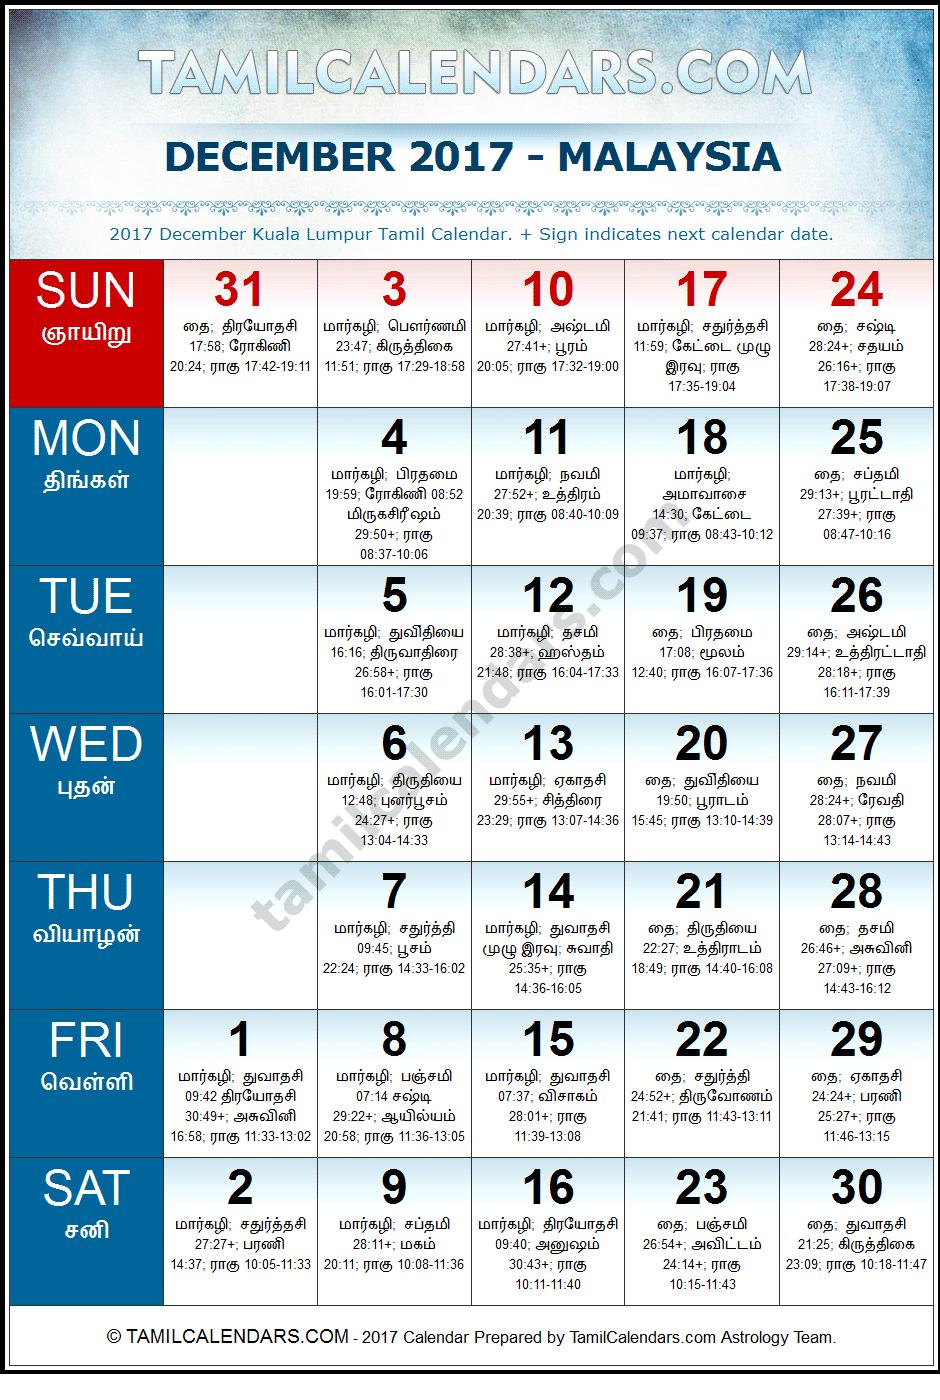 December 2017 Malaysia Tamil Calendar Download Malaysia Tamil Calendars Pdf In Tamil